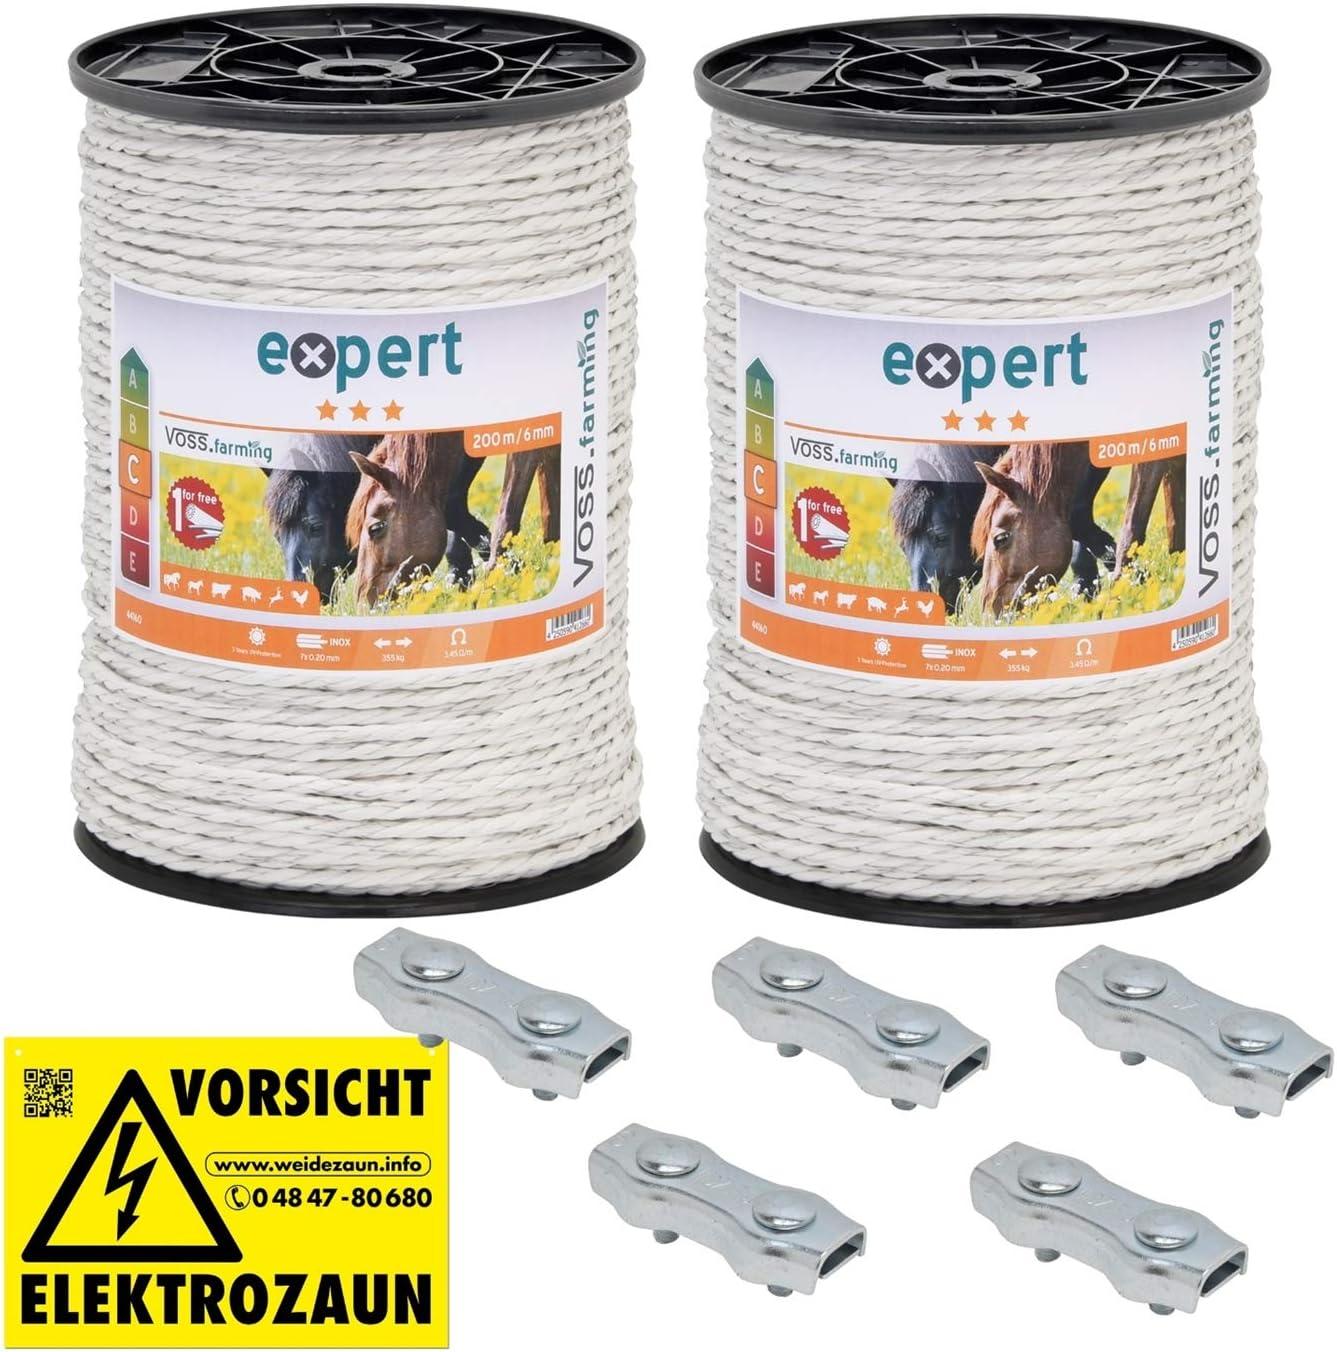 200m Weidezaunseil Elektroseil weiß Ø6mm 6x0,4 Niro Elektrozaun Pferdezaun Litze